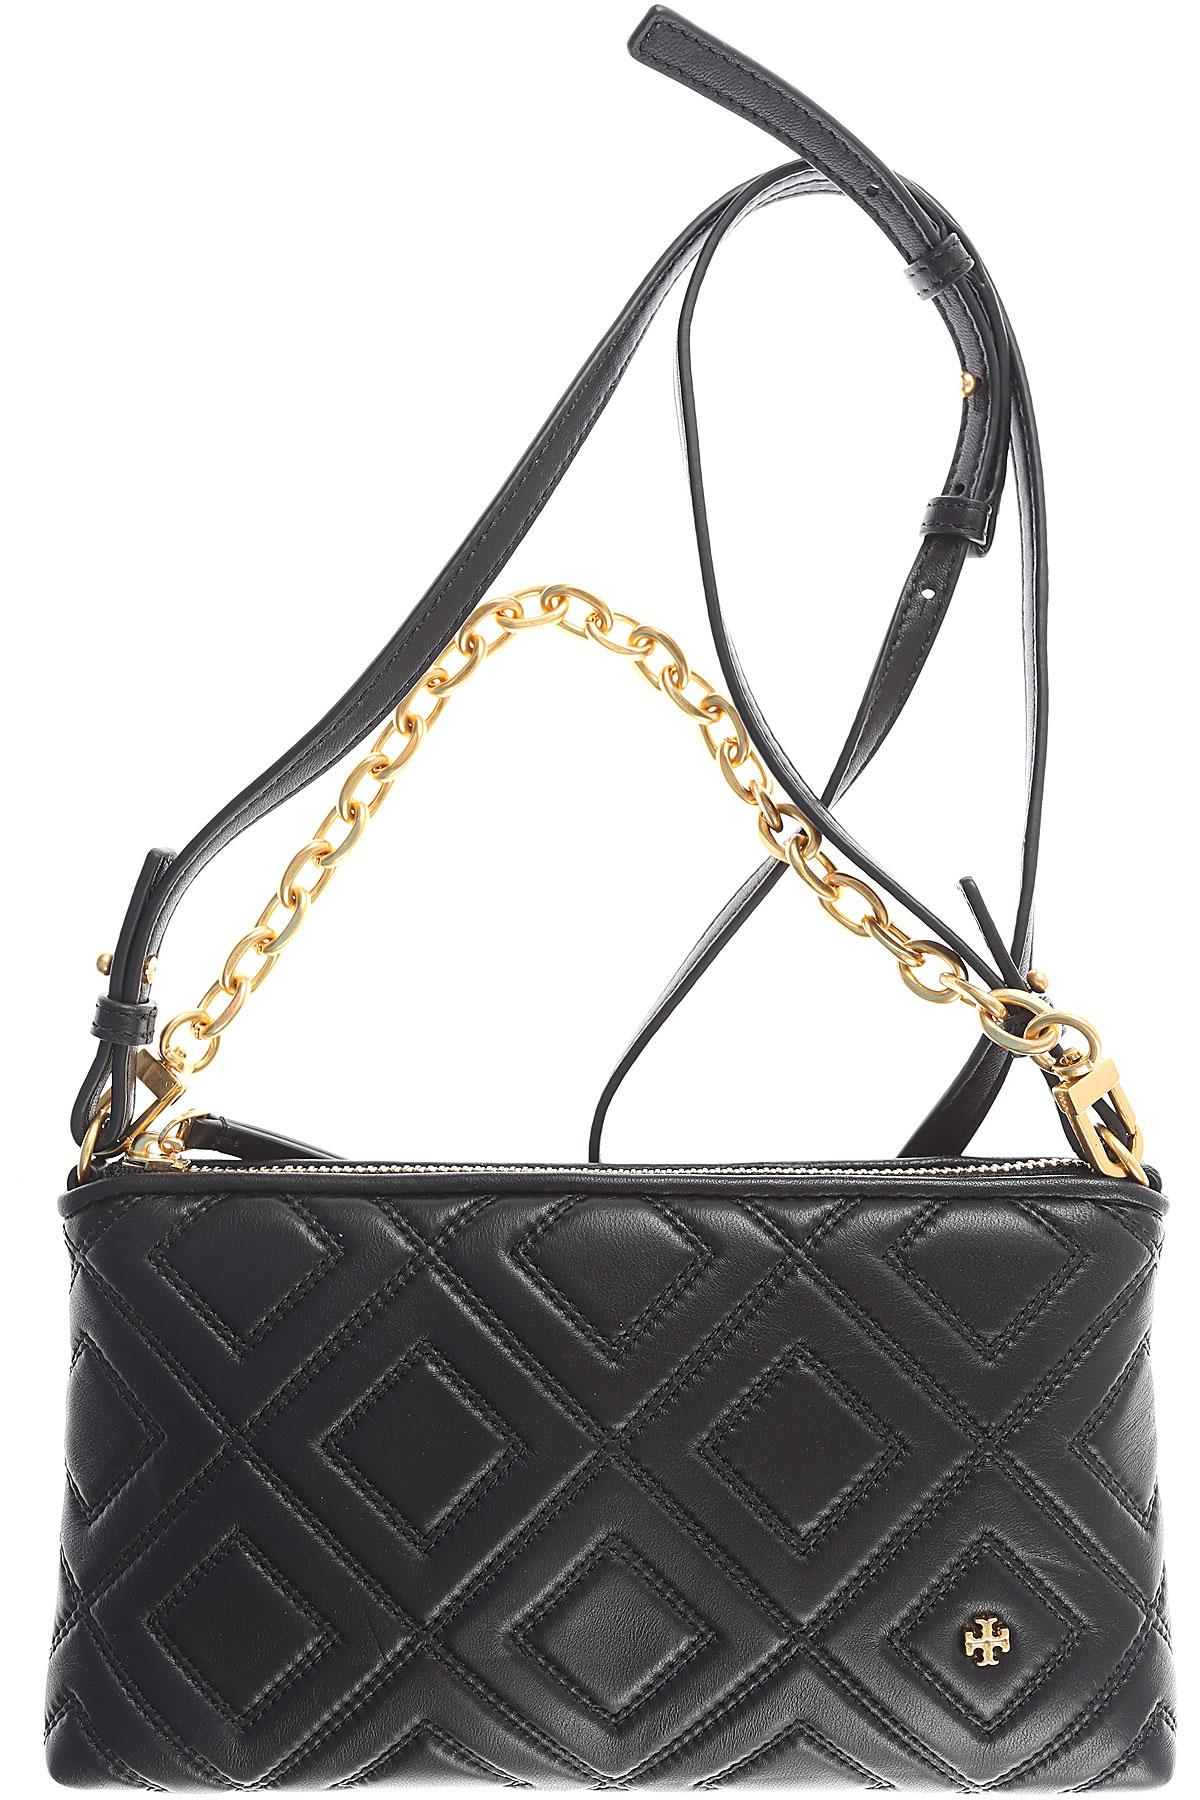 Tory Burch Shoulder Bag for Women On Sale, Black, Calfskin Leather, 2017 USA-459145